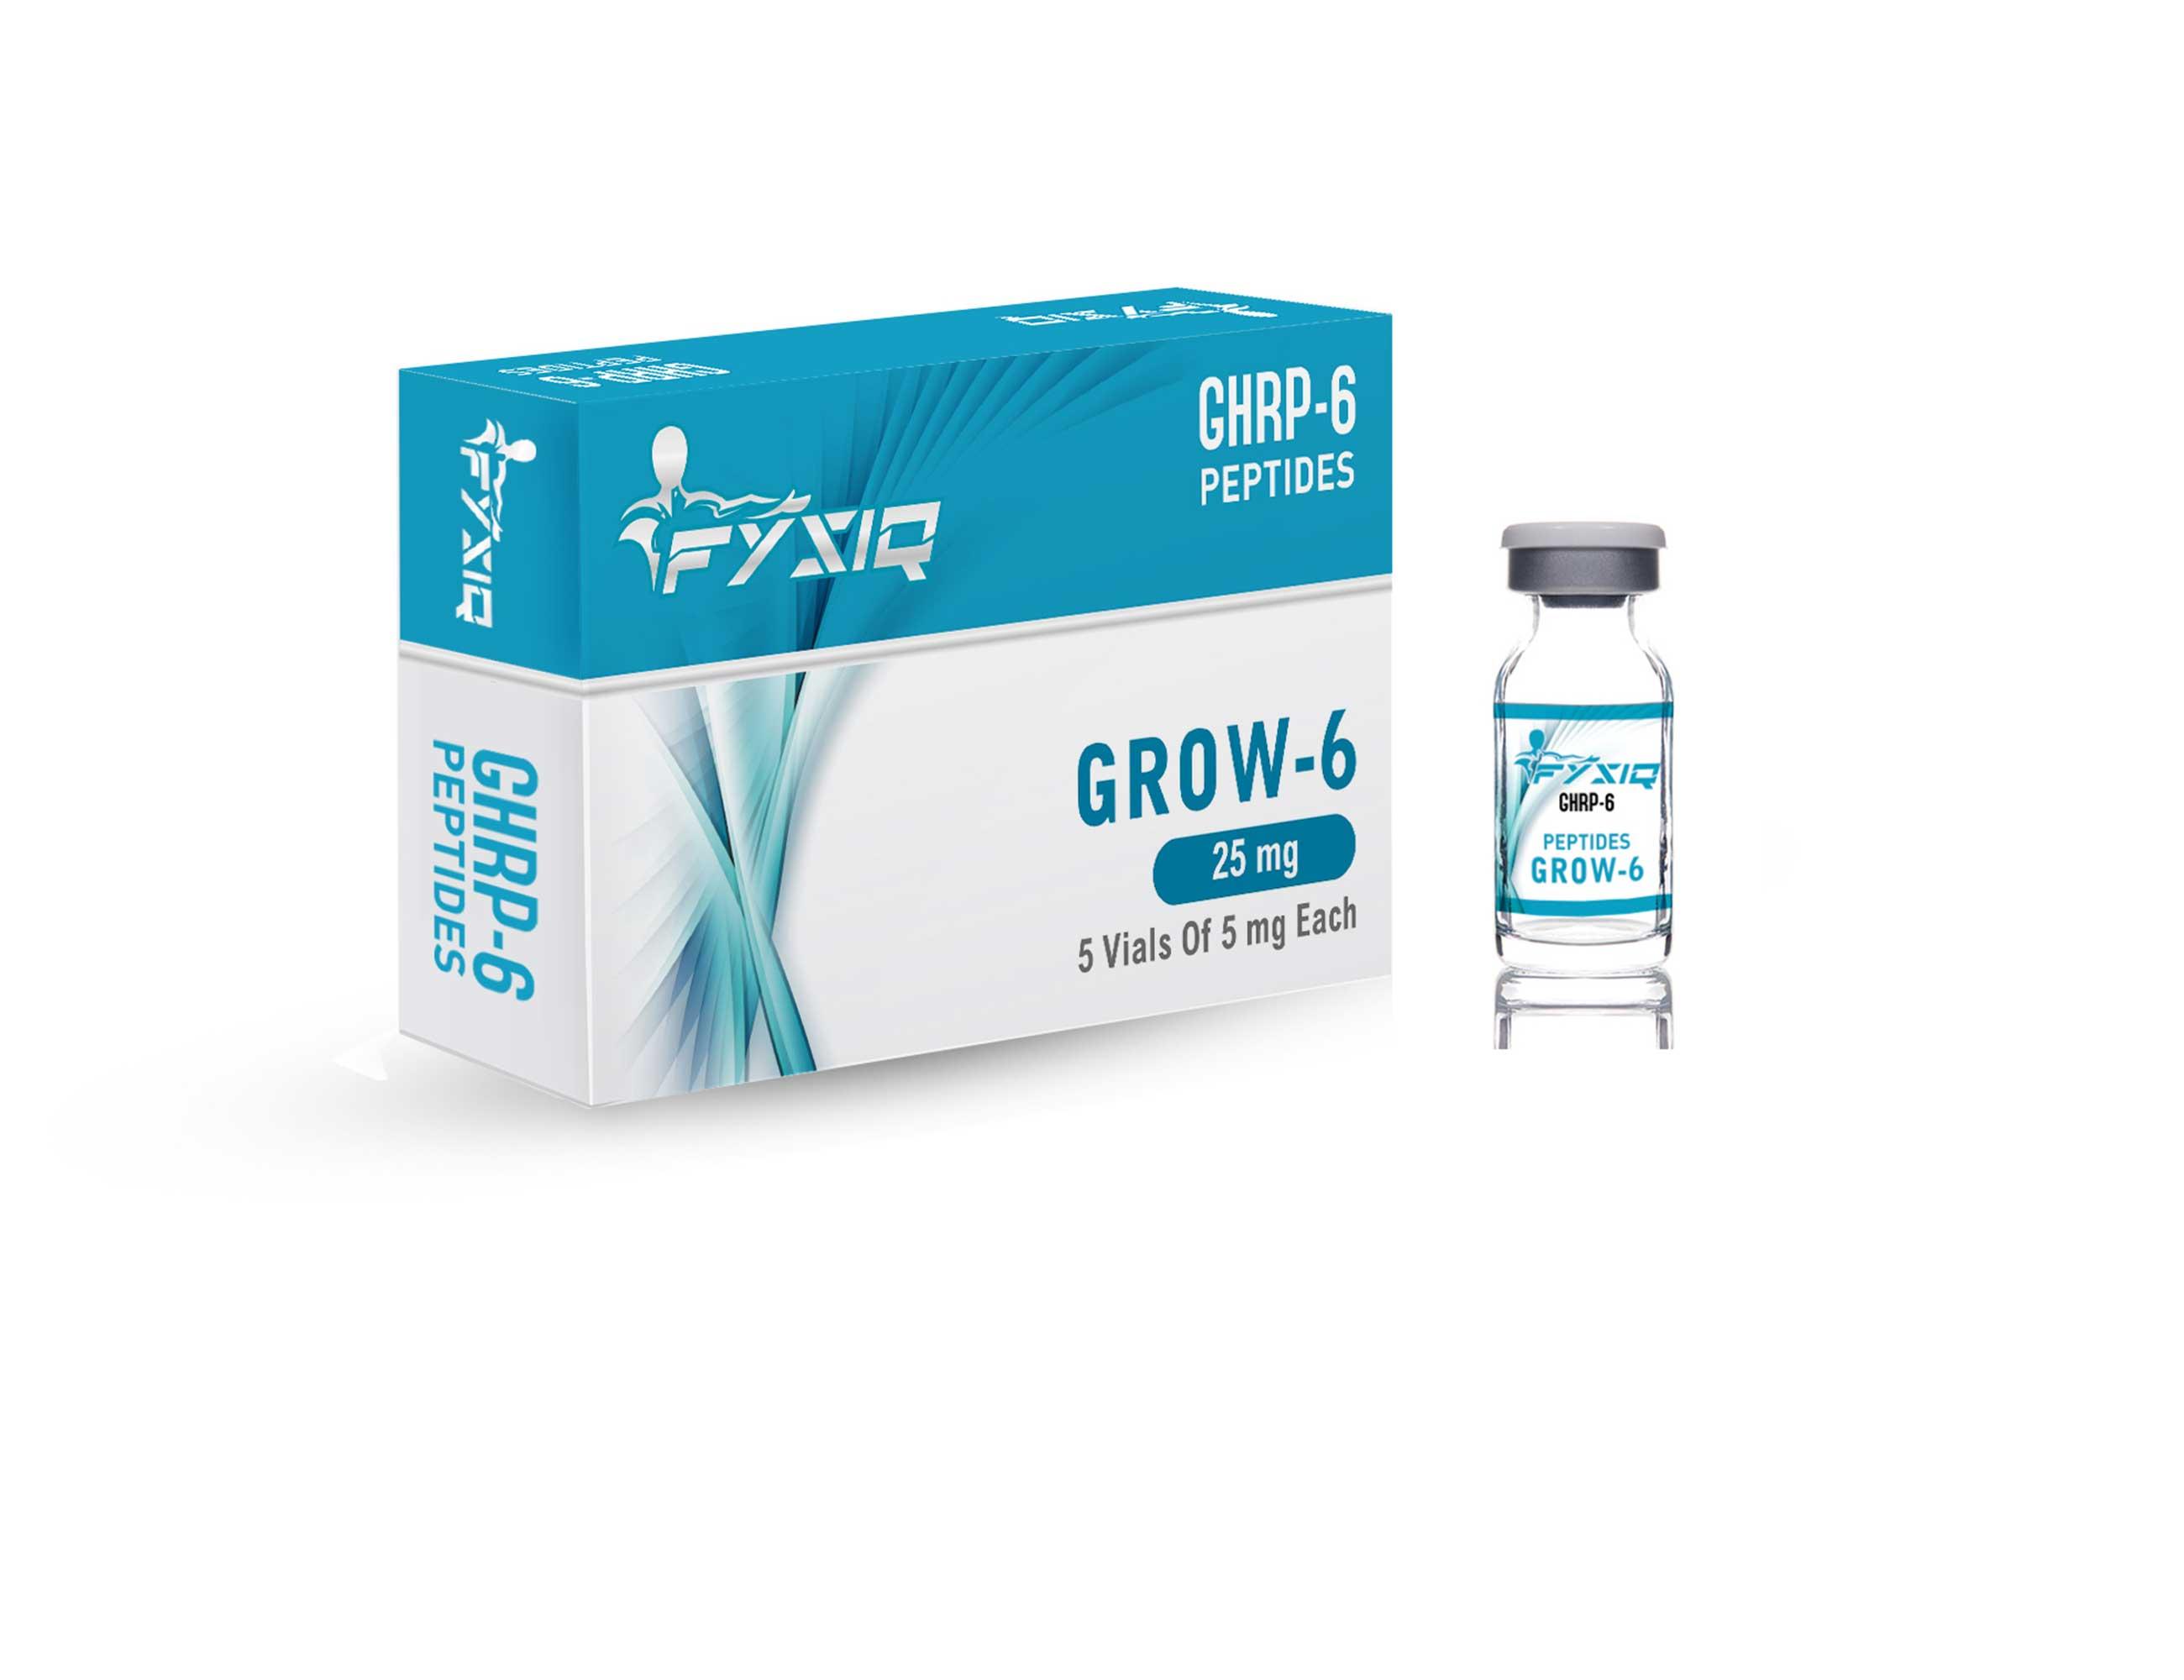 buy fysiqlab inc ghrp 6 25 mg 5 vials of 5 mg online,buy fysiqlab inc ghrp 6 25 mg 5 vials of 5 mg,buy fysiqlab ghrp 6 25 mg 5 vials of 5 mg online,buy ghrp 6 25 mg 5 vials of 5 mg online,buy fysiqlab inc ghrp 6 25 mg 5 vials of 5 mg online,buy fysiqlab inc grow 6 online,buy fysiqlab inc grow 6,buy fysiqlab grow 6 online,buy grow 6 online